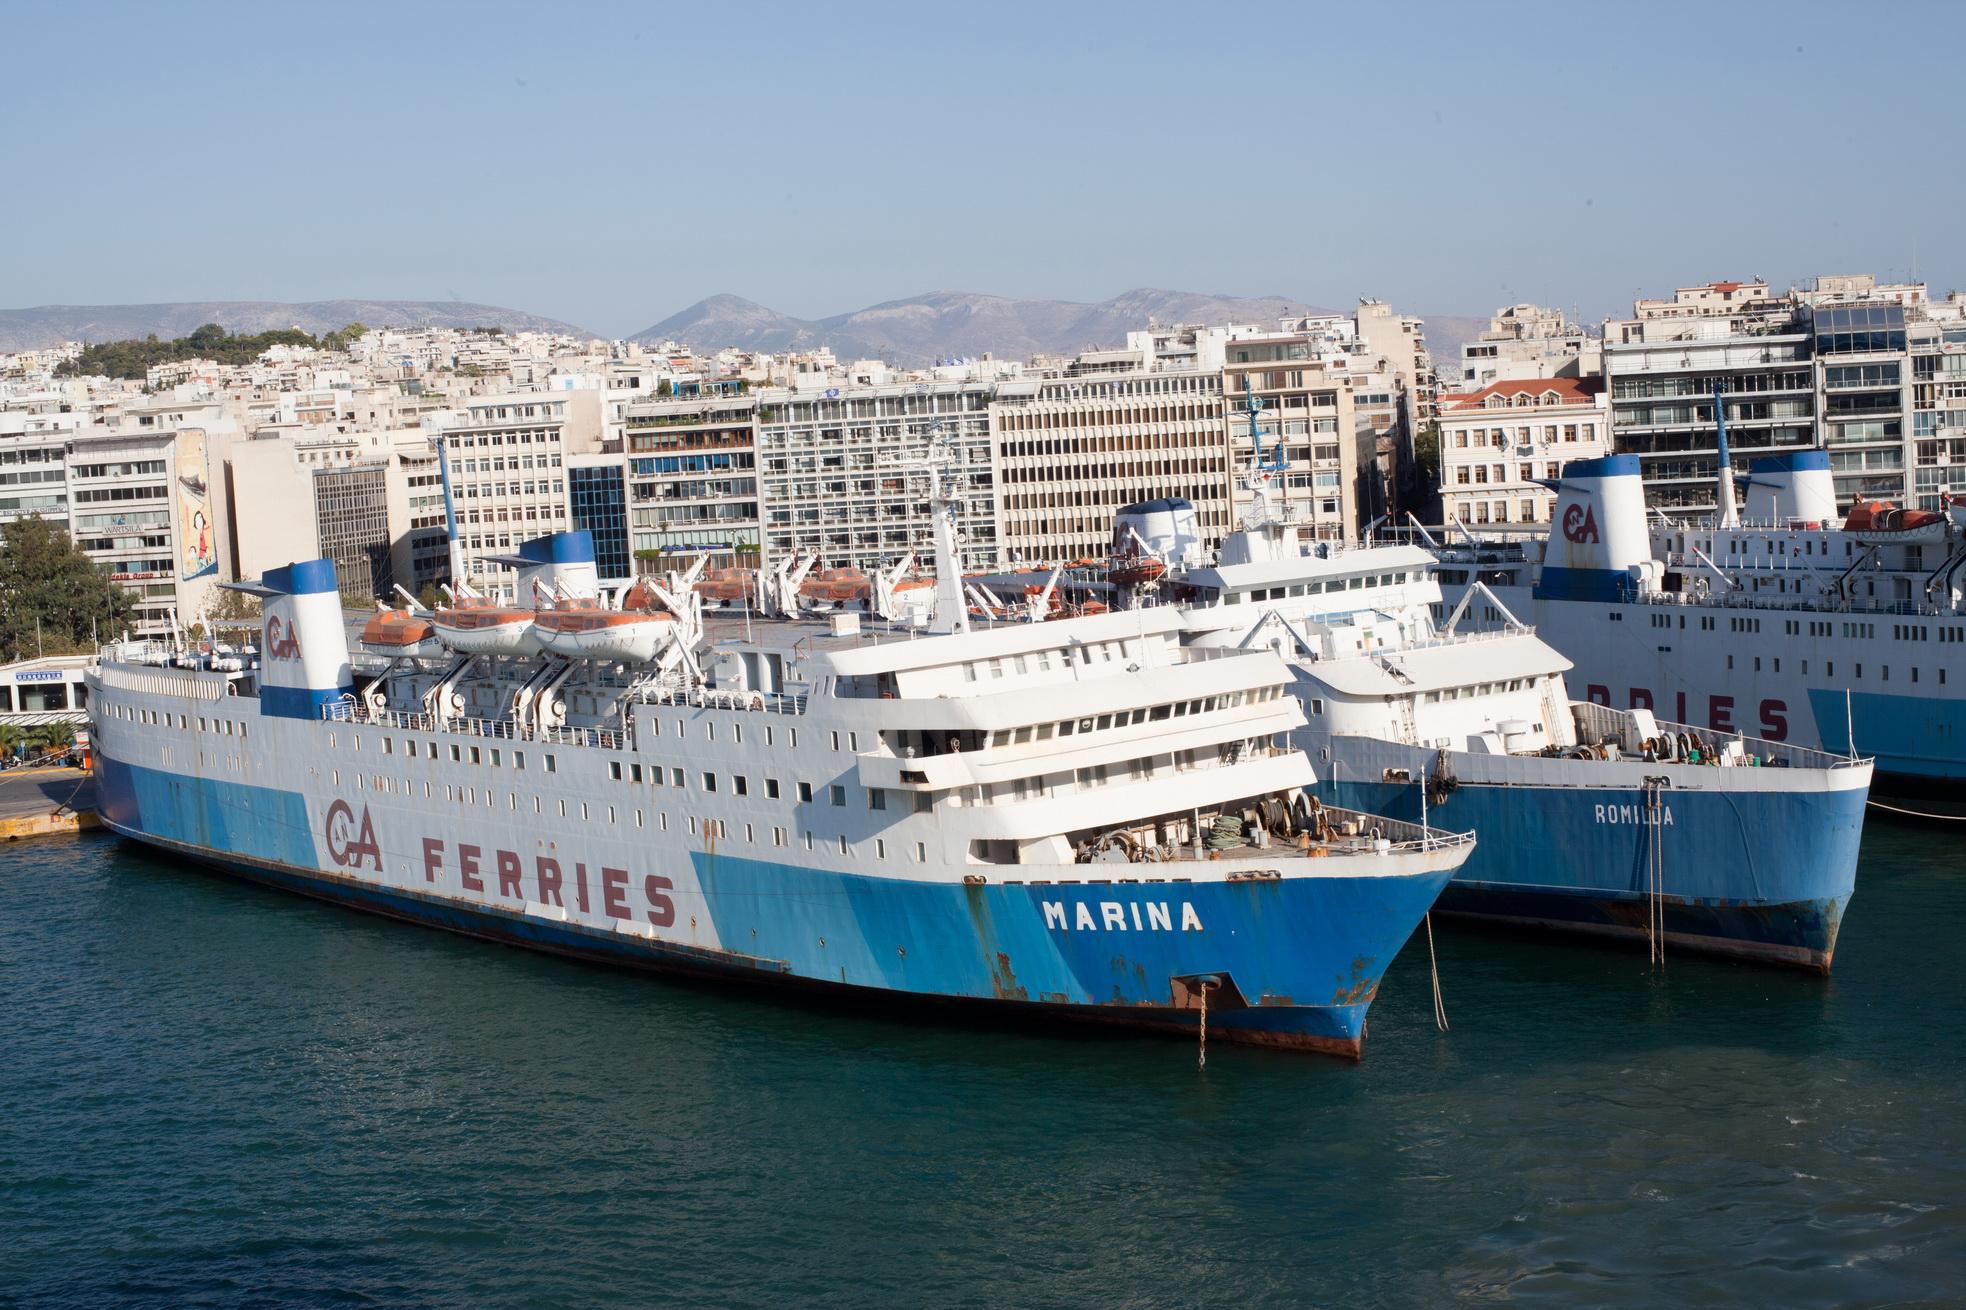 MS Marina IMO 7203487 and Romilda IMO 7368499 GA Ferries docked Piraeus Port of Athens Greece 01